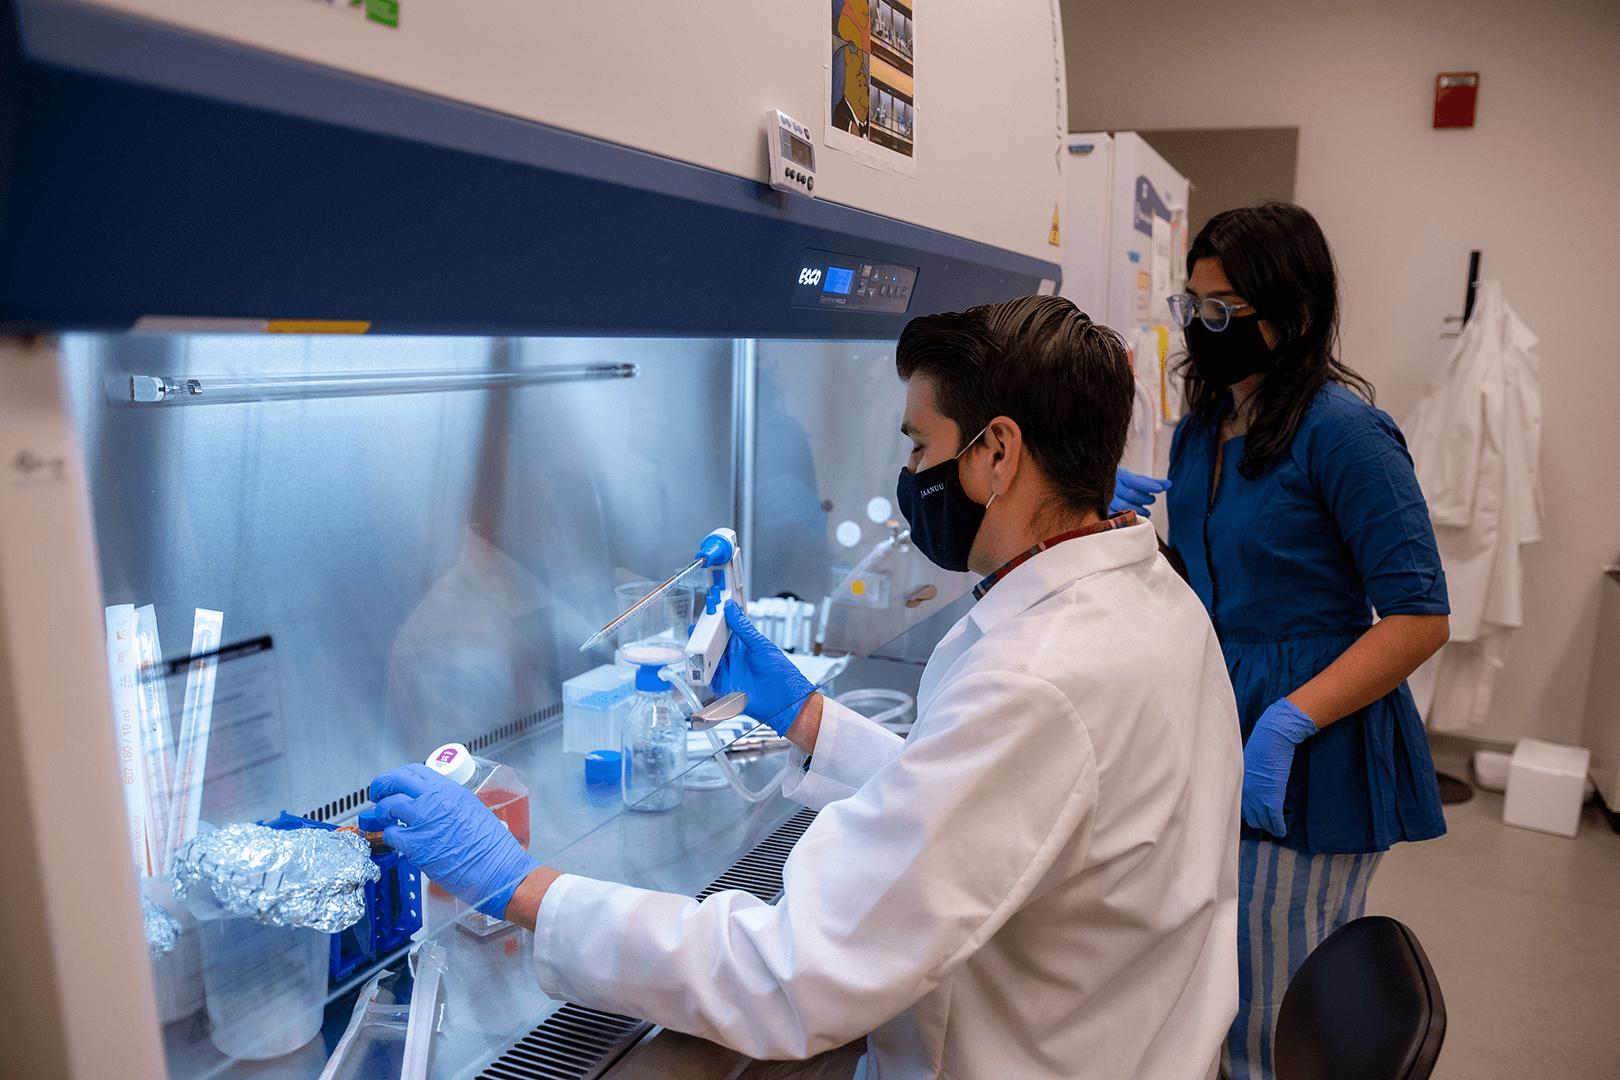 Underhill lab tech testing samples